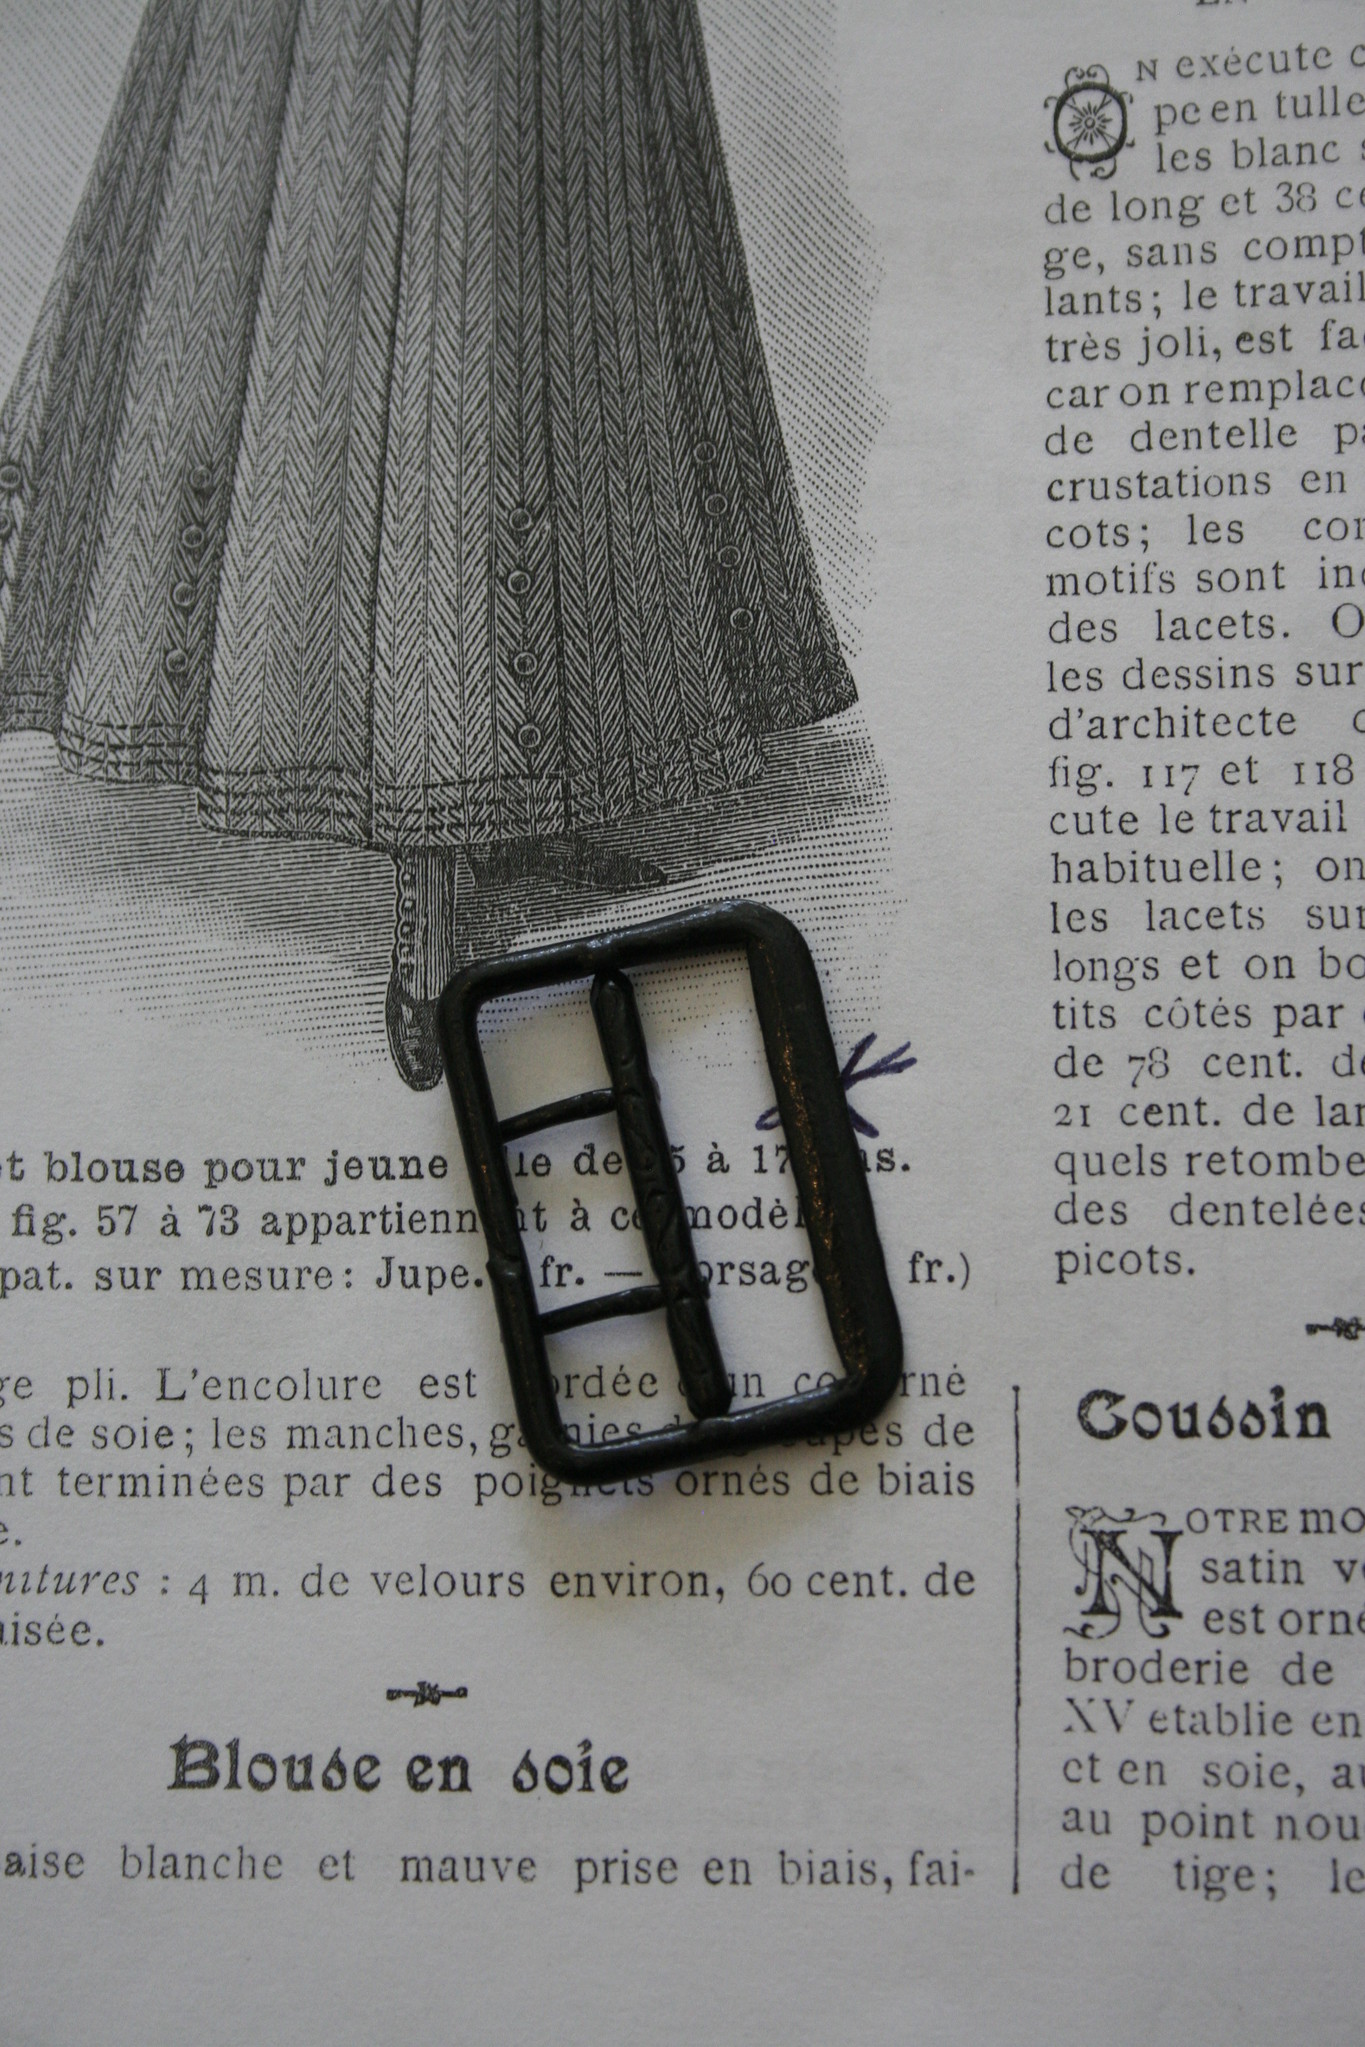 Vintage waistcoat buckle.